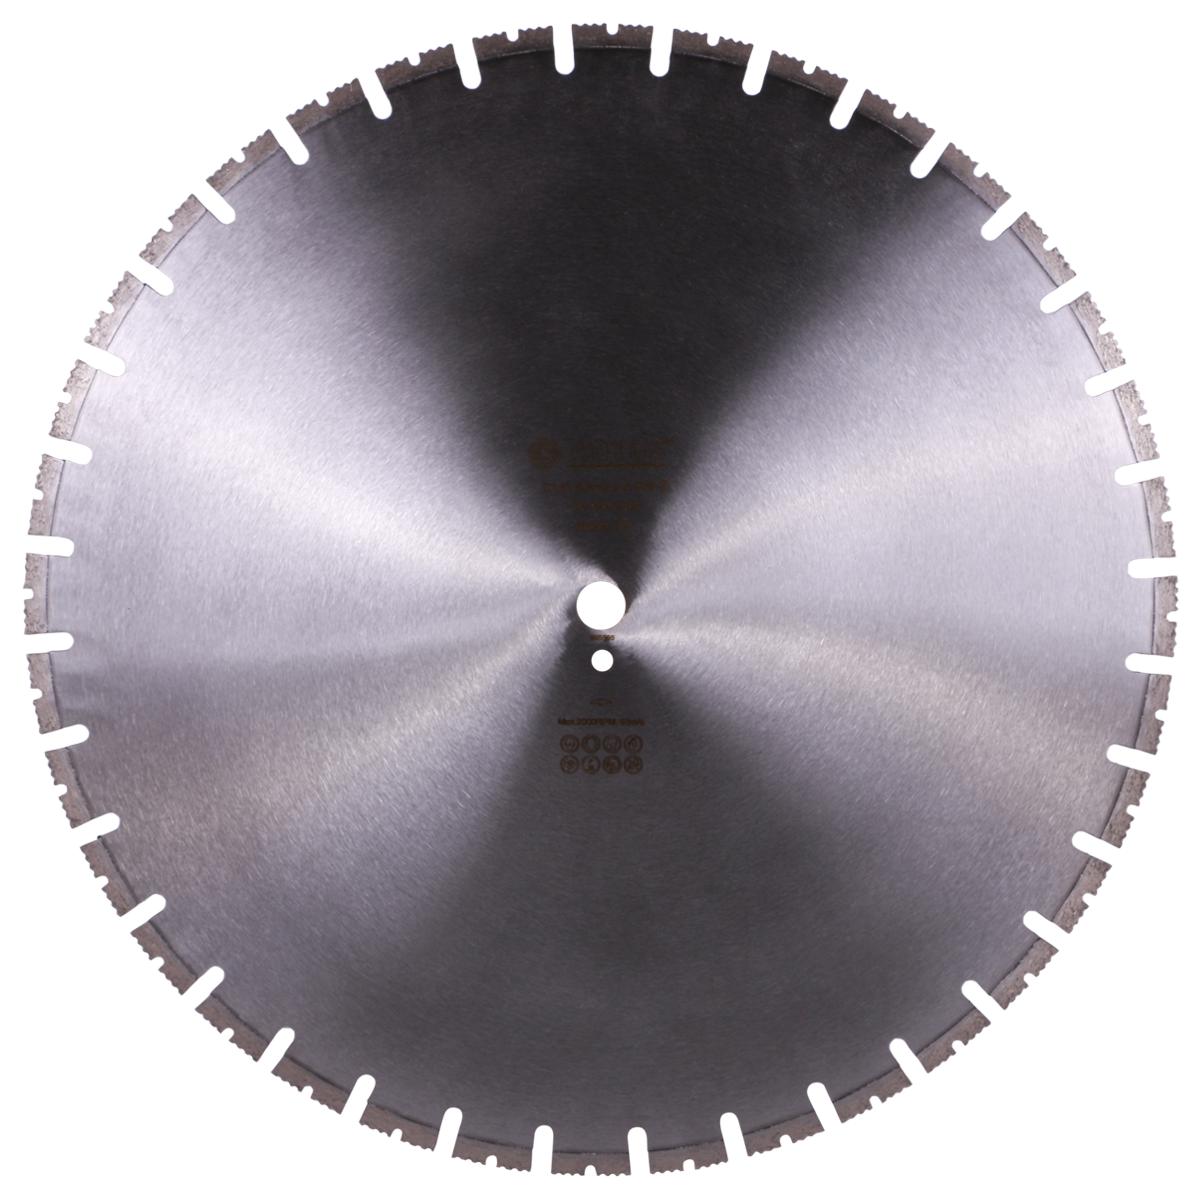 Круг алмазный отрезной 1A1RSS/C1-W 604x4,5/3,5x12x25,4-36 F4 CLG 604/25,4 RS-Z